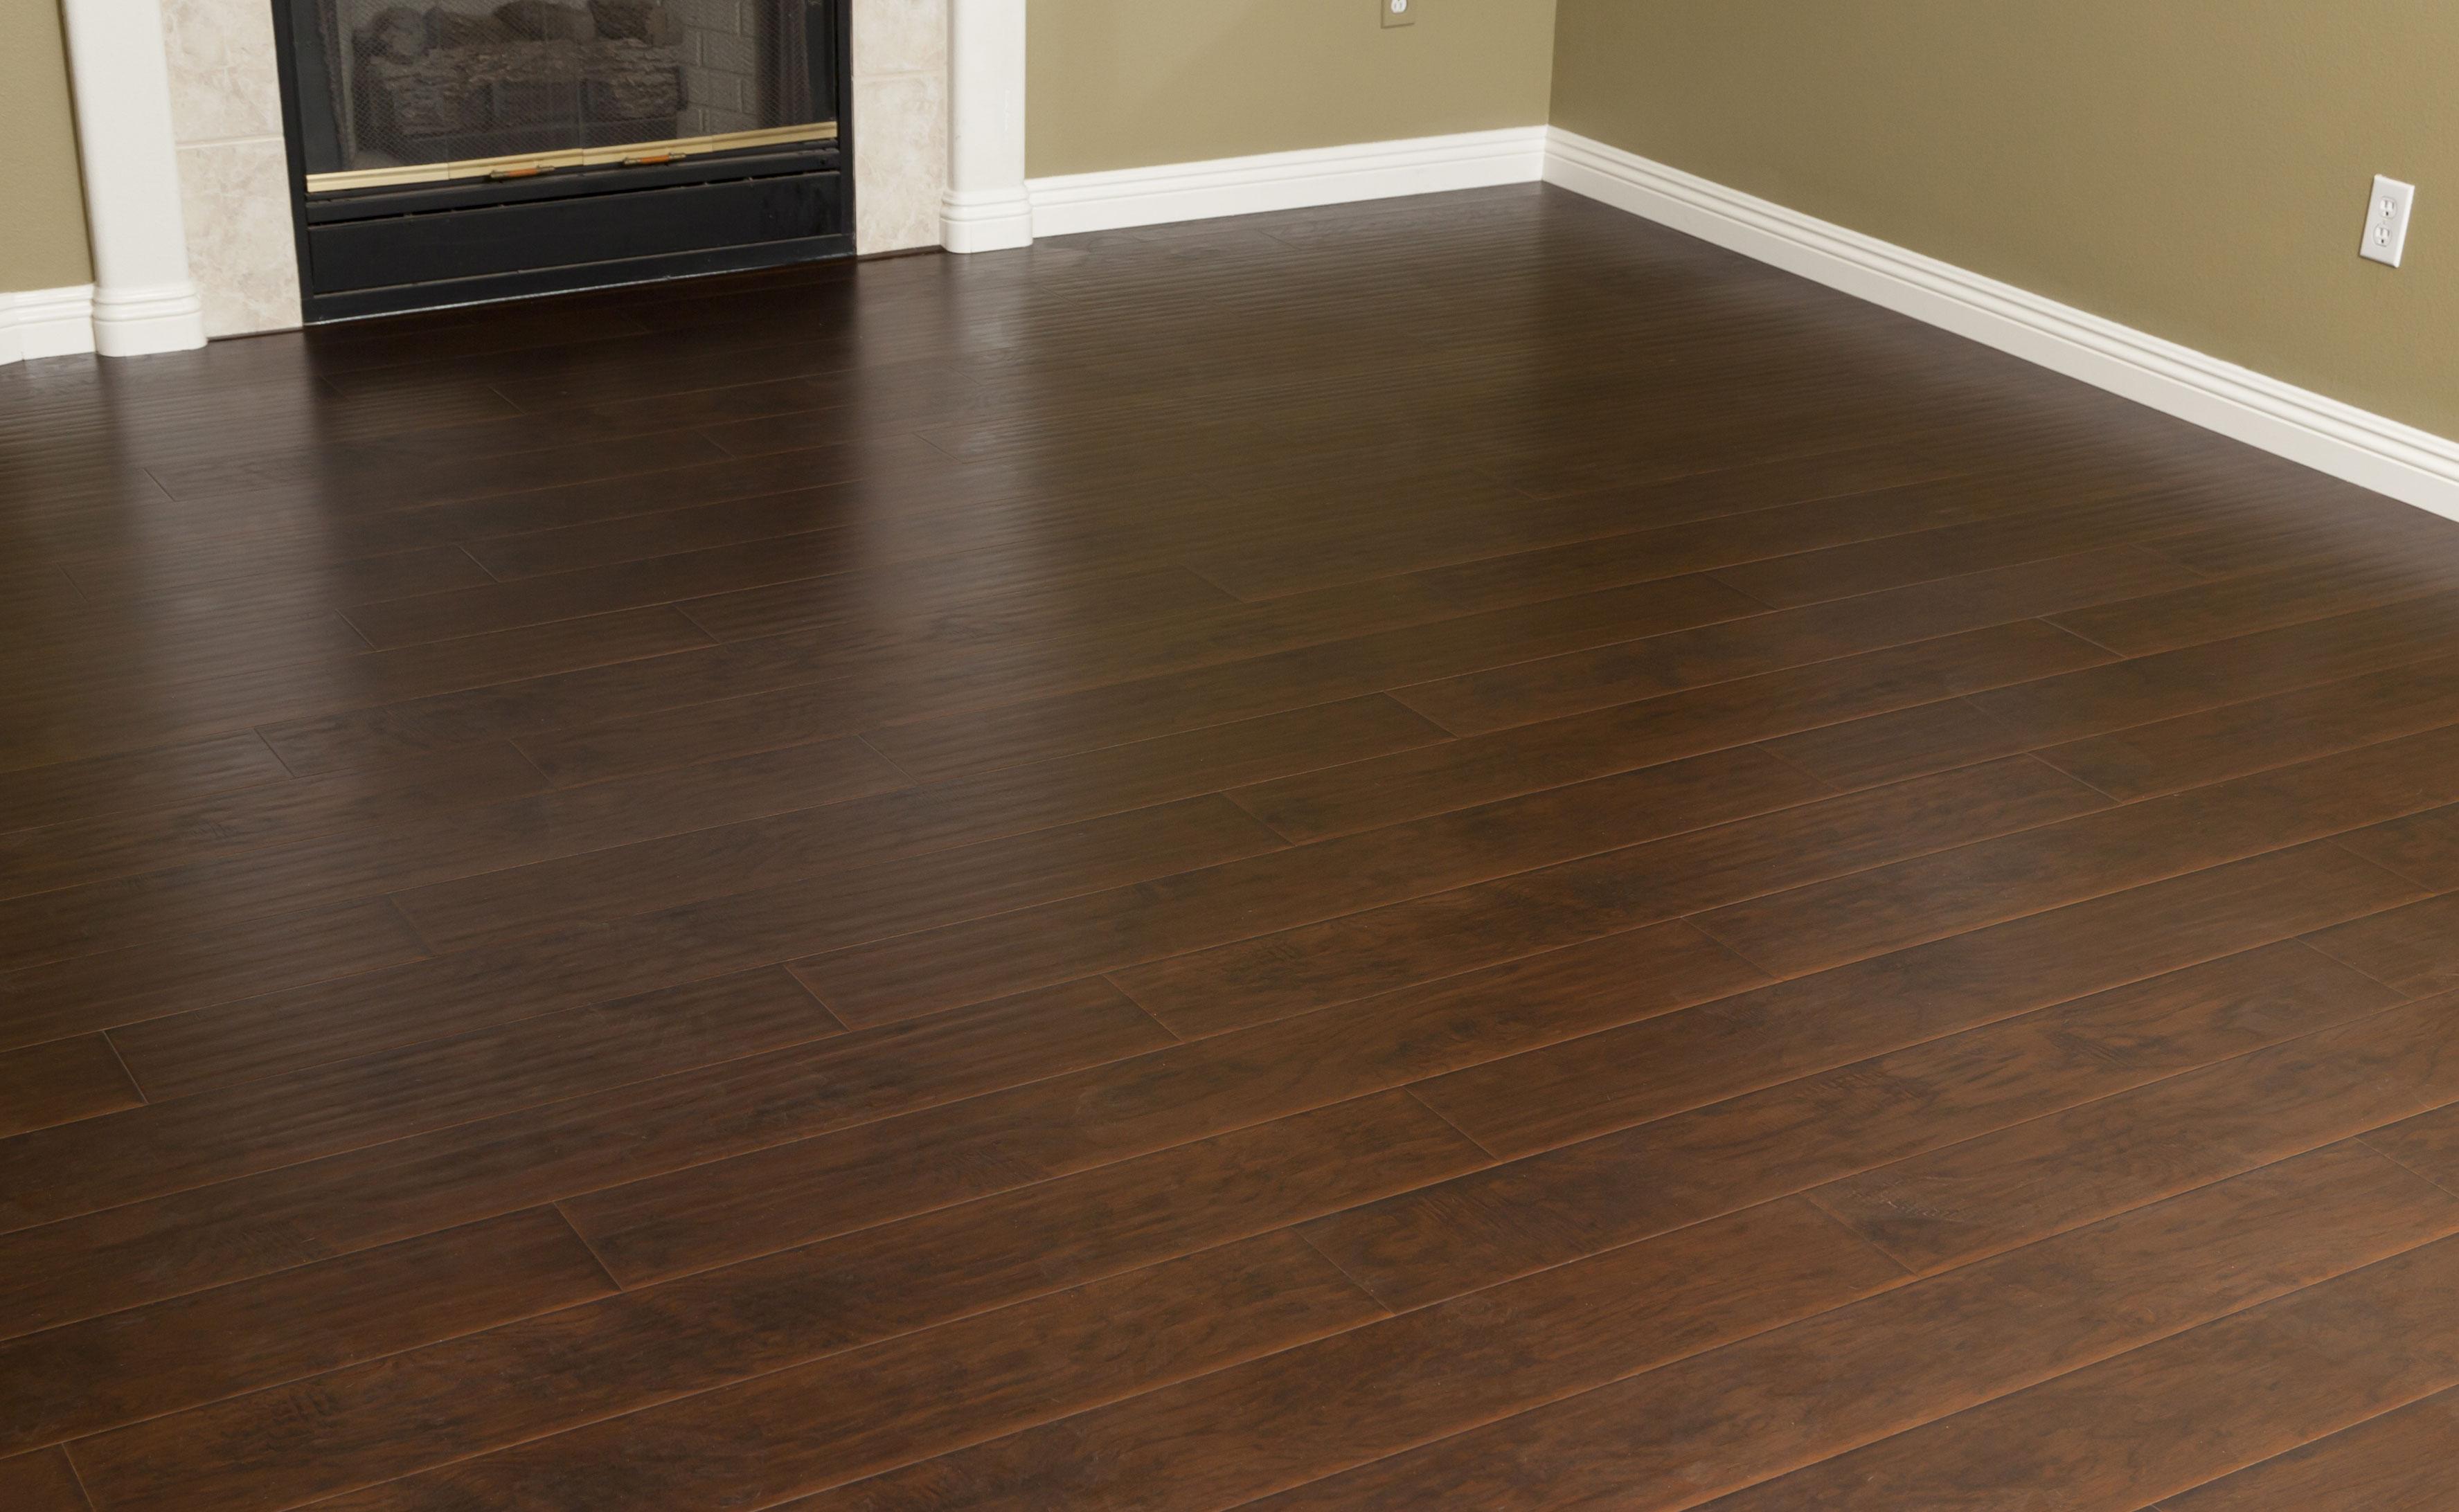 hardwood floor refinishing hardwood flooring MSTKGMC